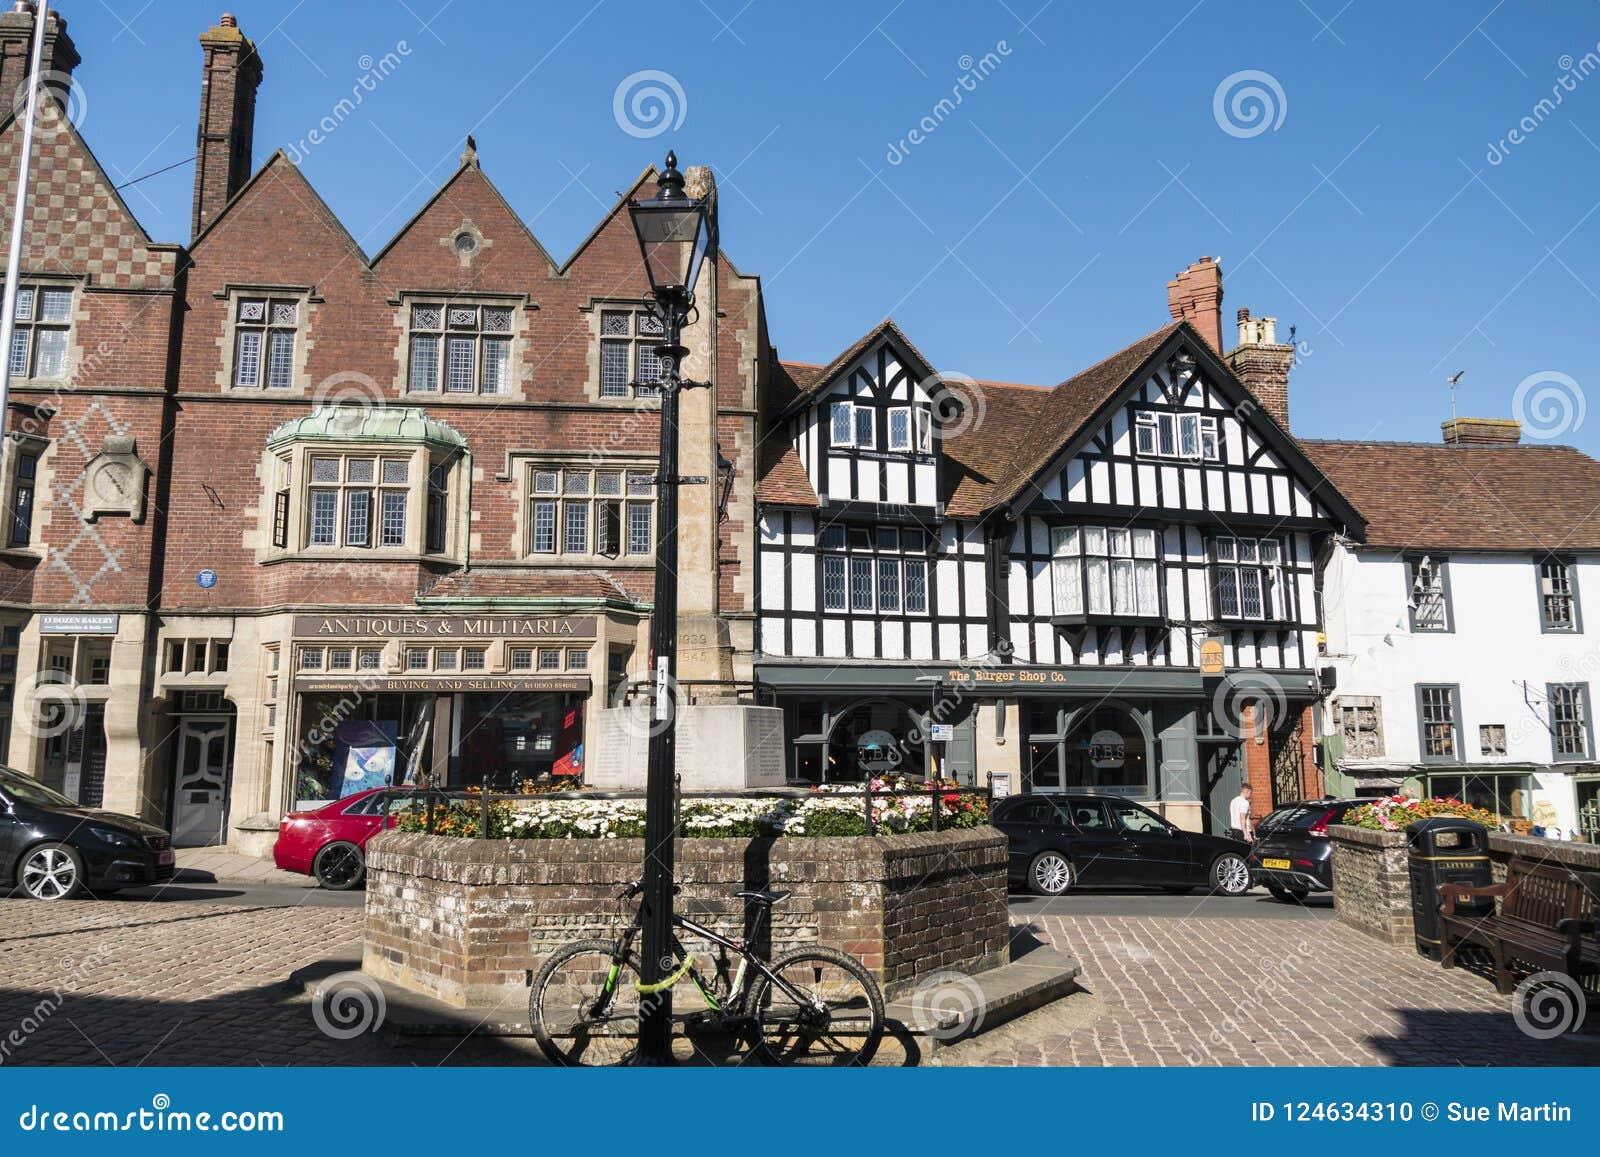 Arundel Town, West Sussex UK Editorial Image - Image of britain